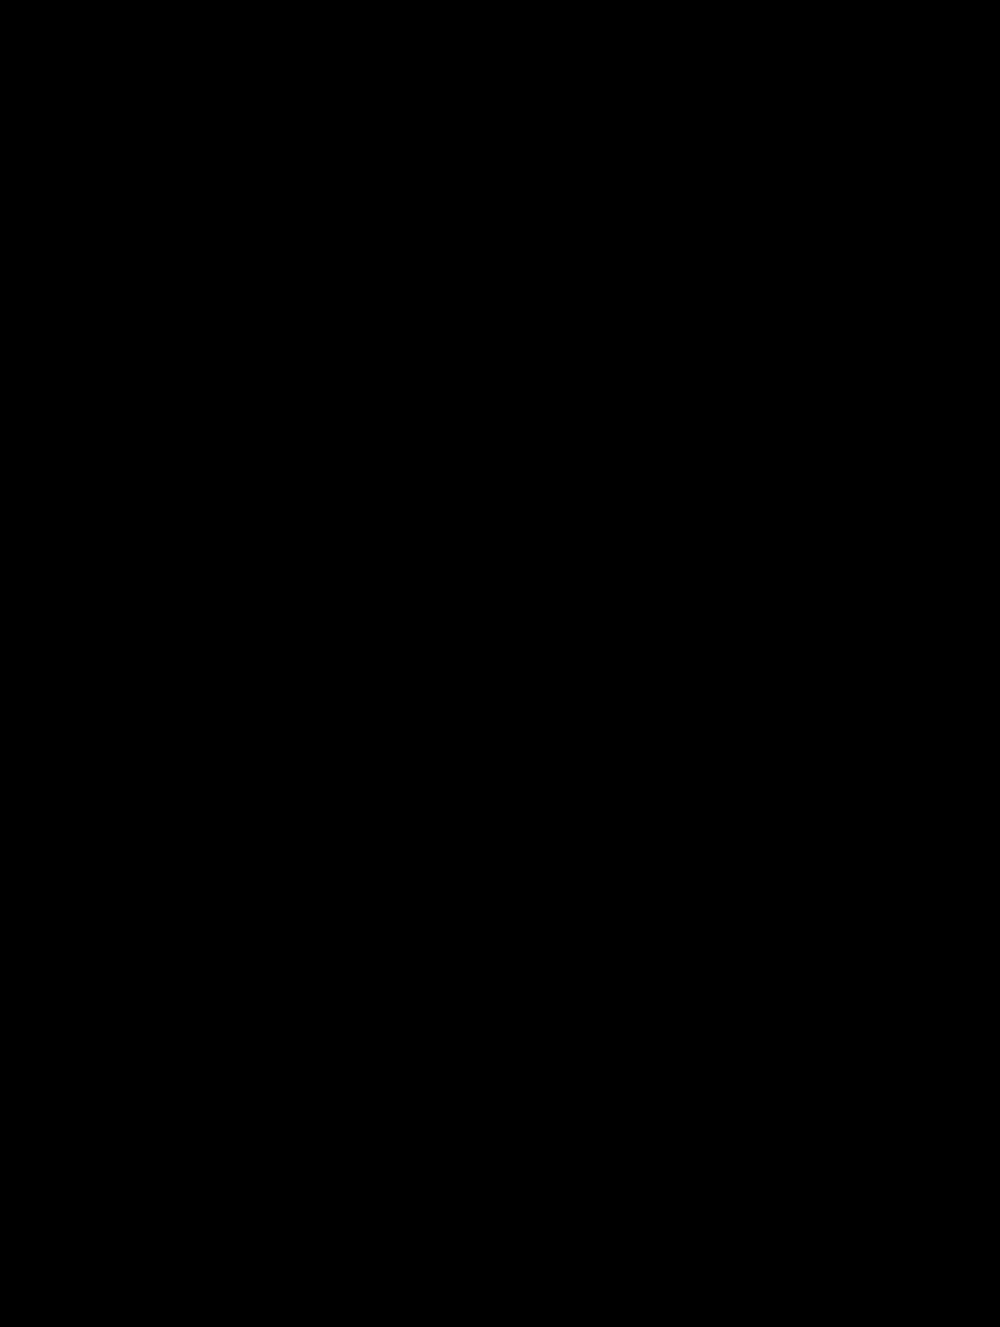 Stickneybrook, William Hays reduction linocut